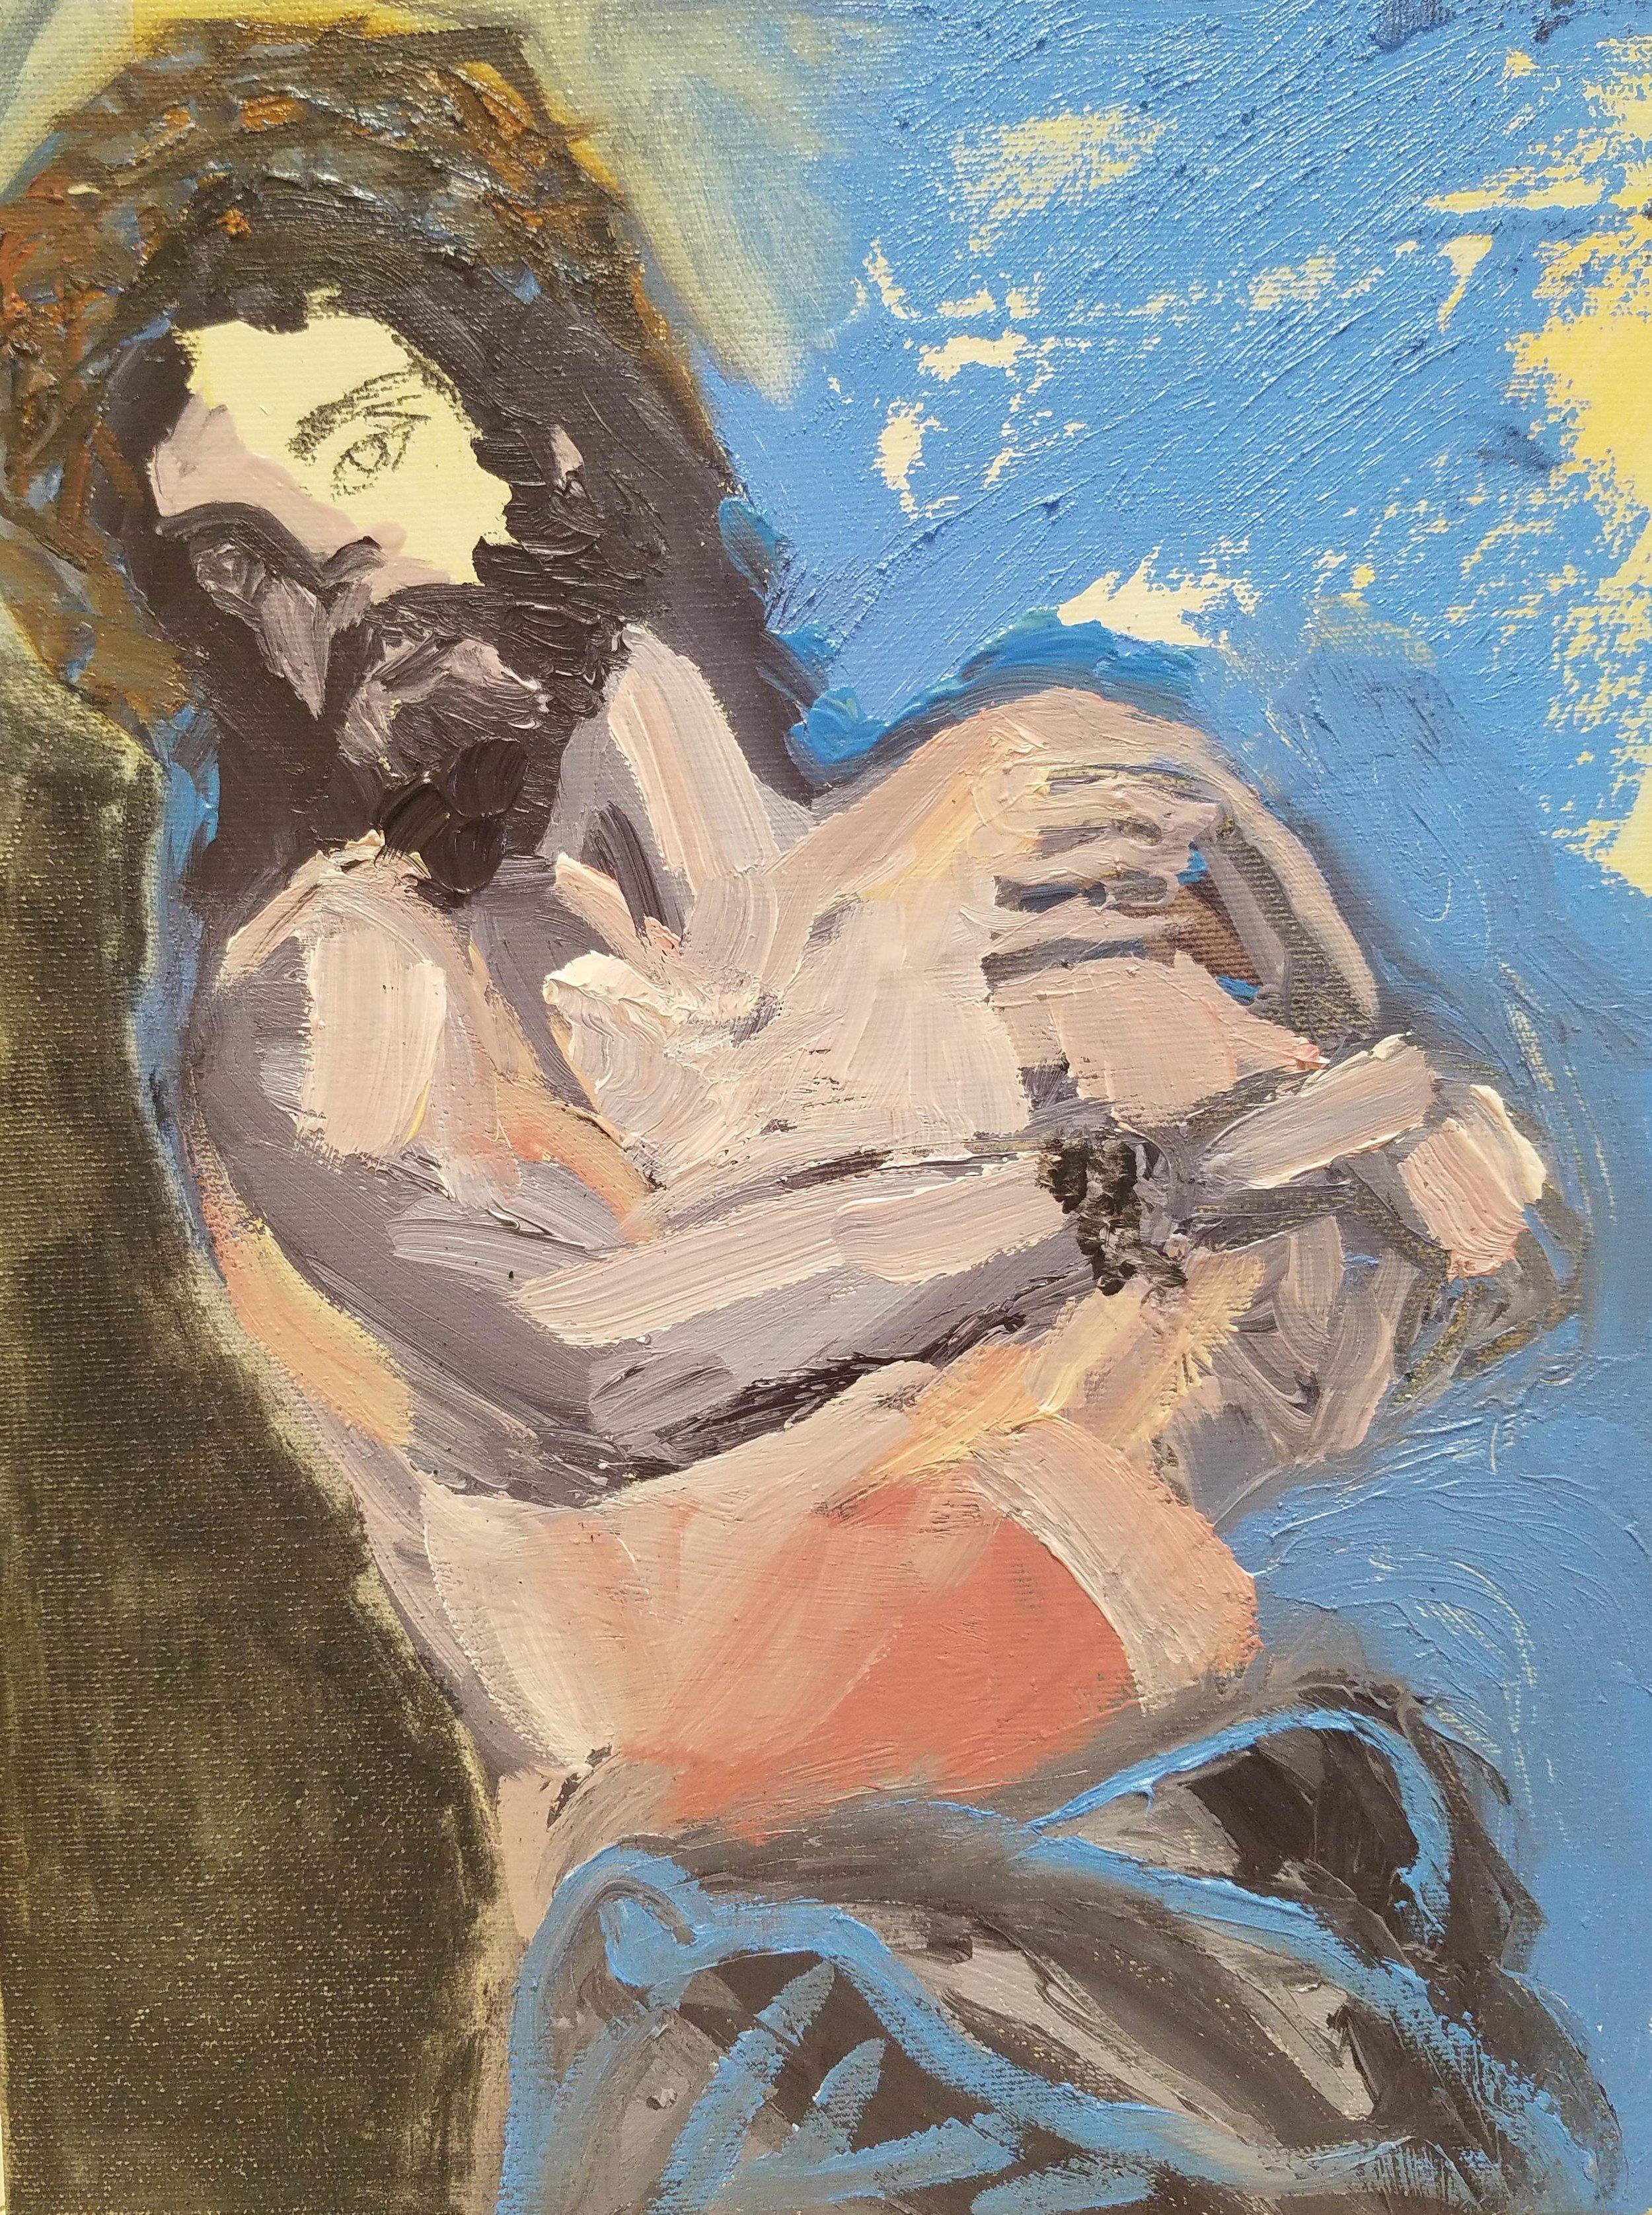 Patti Smith Land 250: Christ. genge fetal. Haus du Kunst. Munich